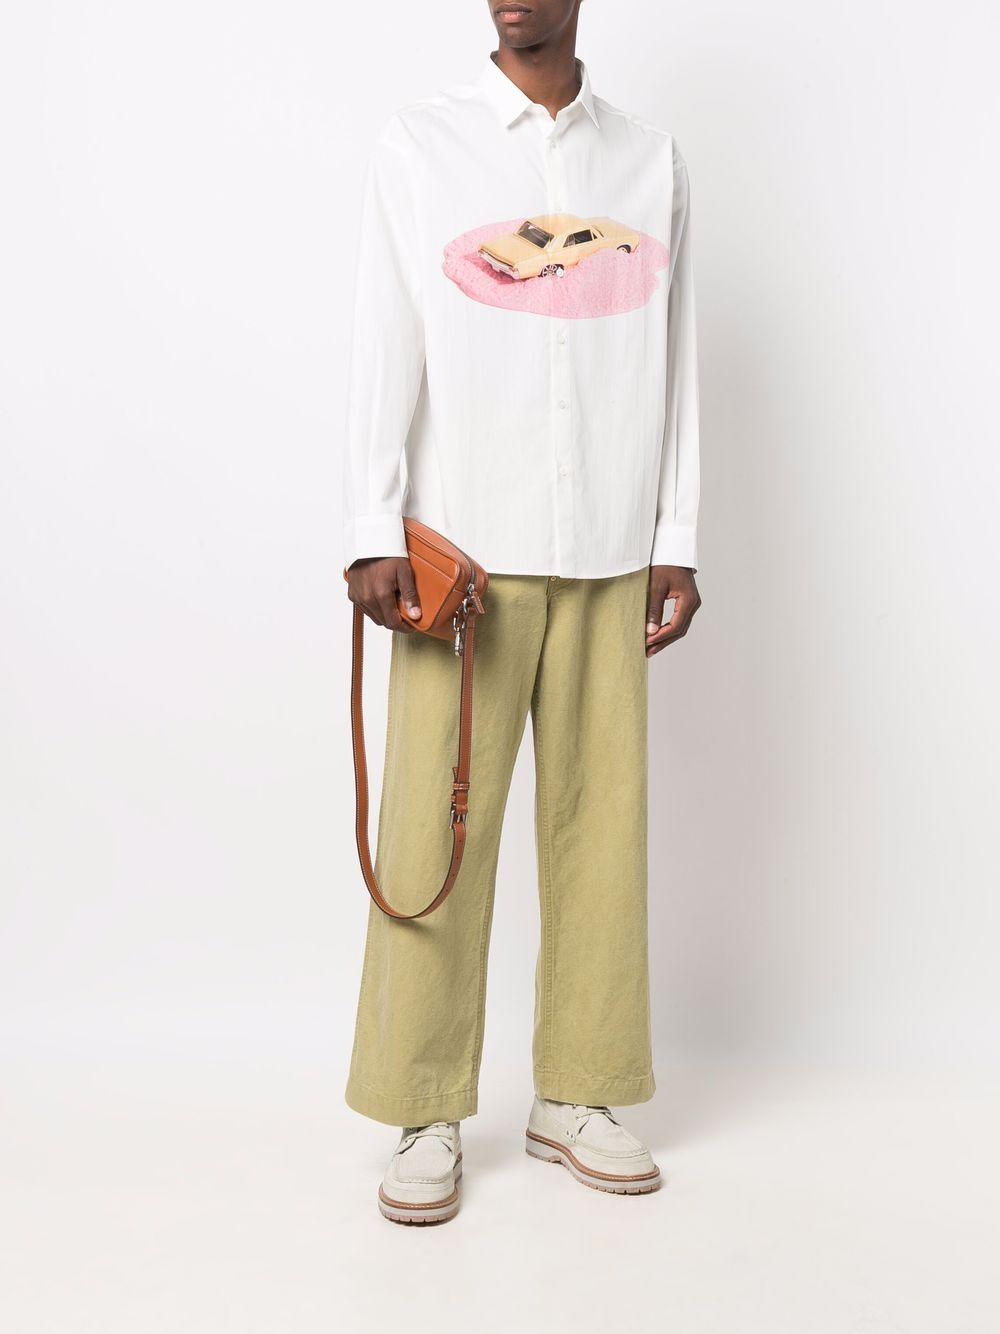 la chemise henri shirt man white in cotton JACQUEMUS   Shirts   216SH03-2161AM